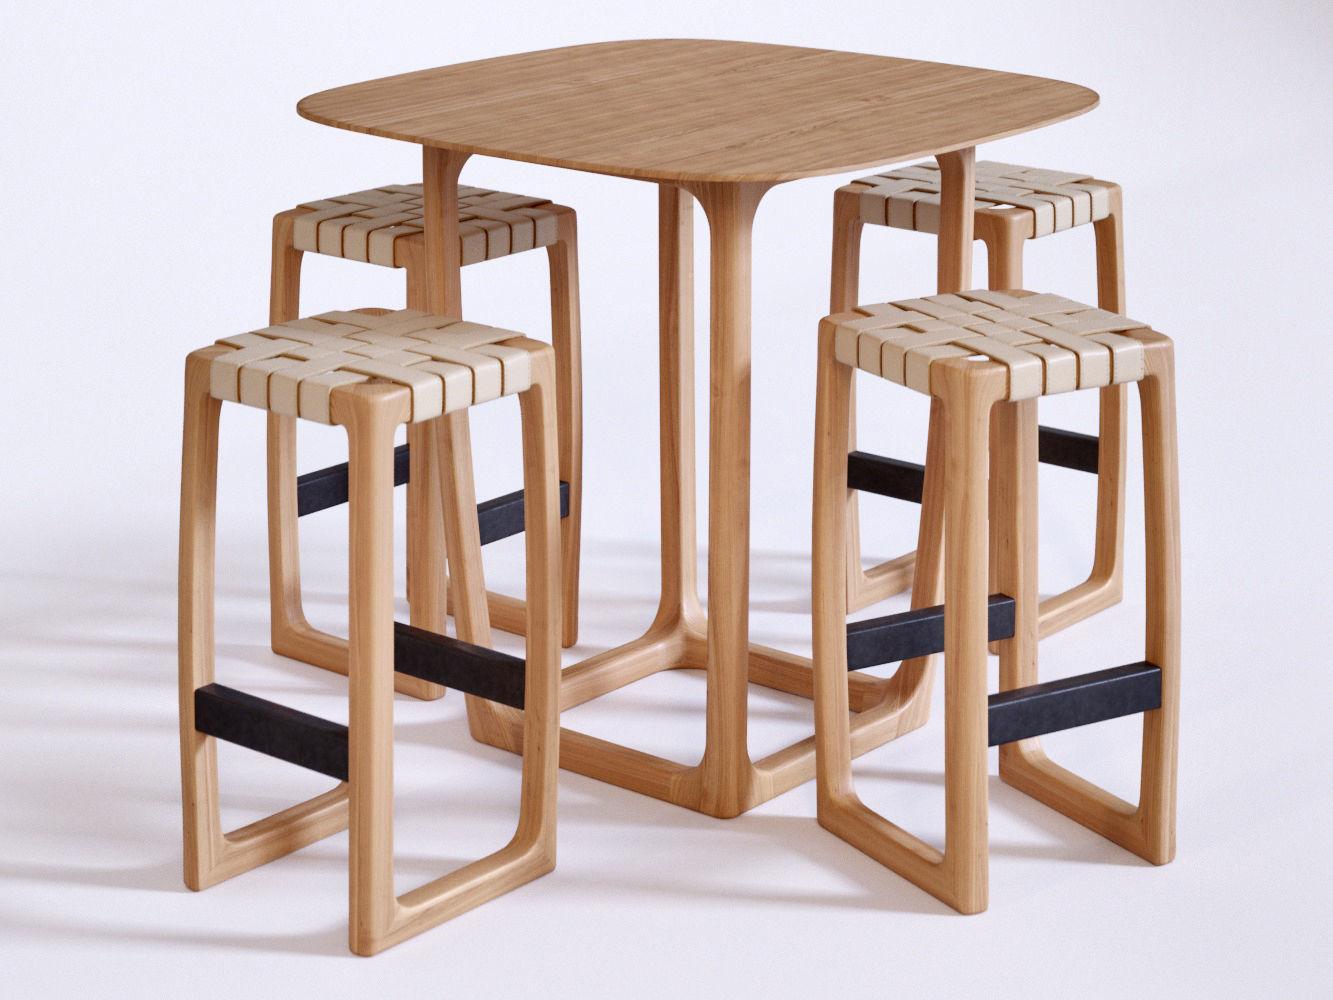 usona furniture. Usona Bar Set 3d Model Low-poly Max Obj 1 Furniture O